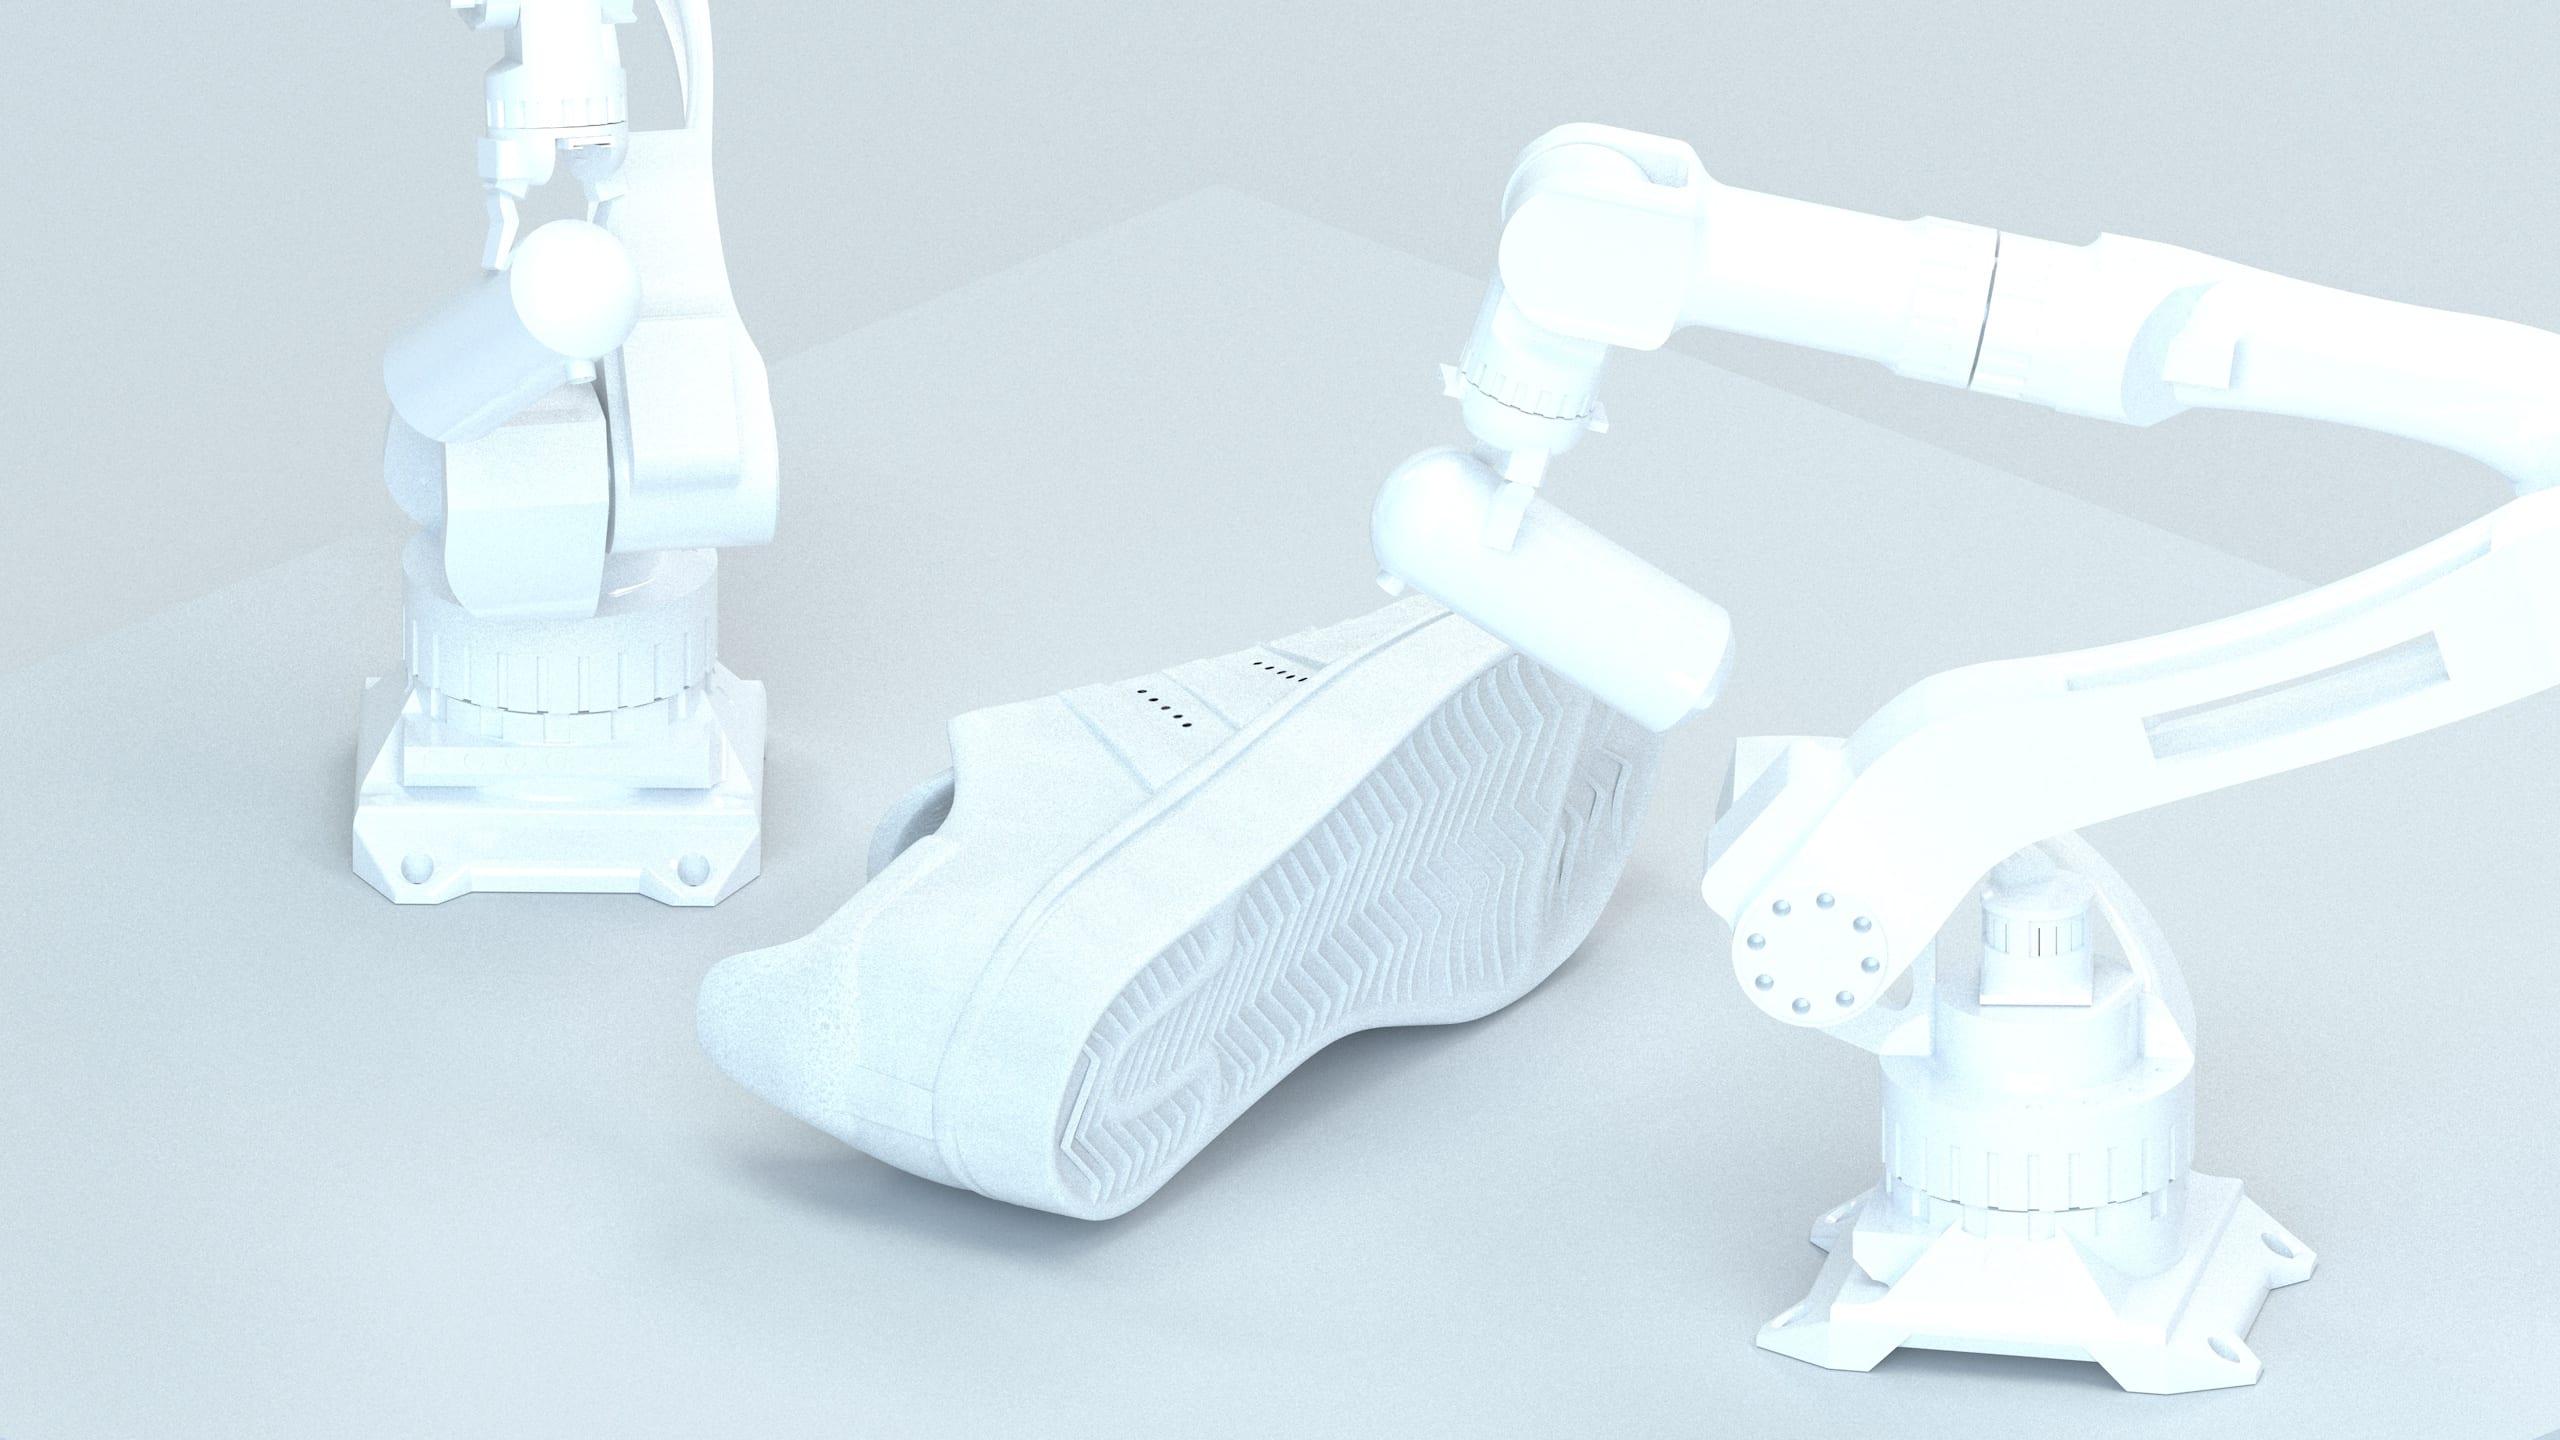 ADIDAS_ROBOTs-3